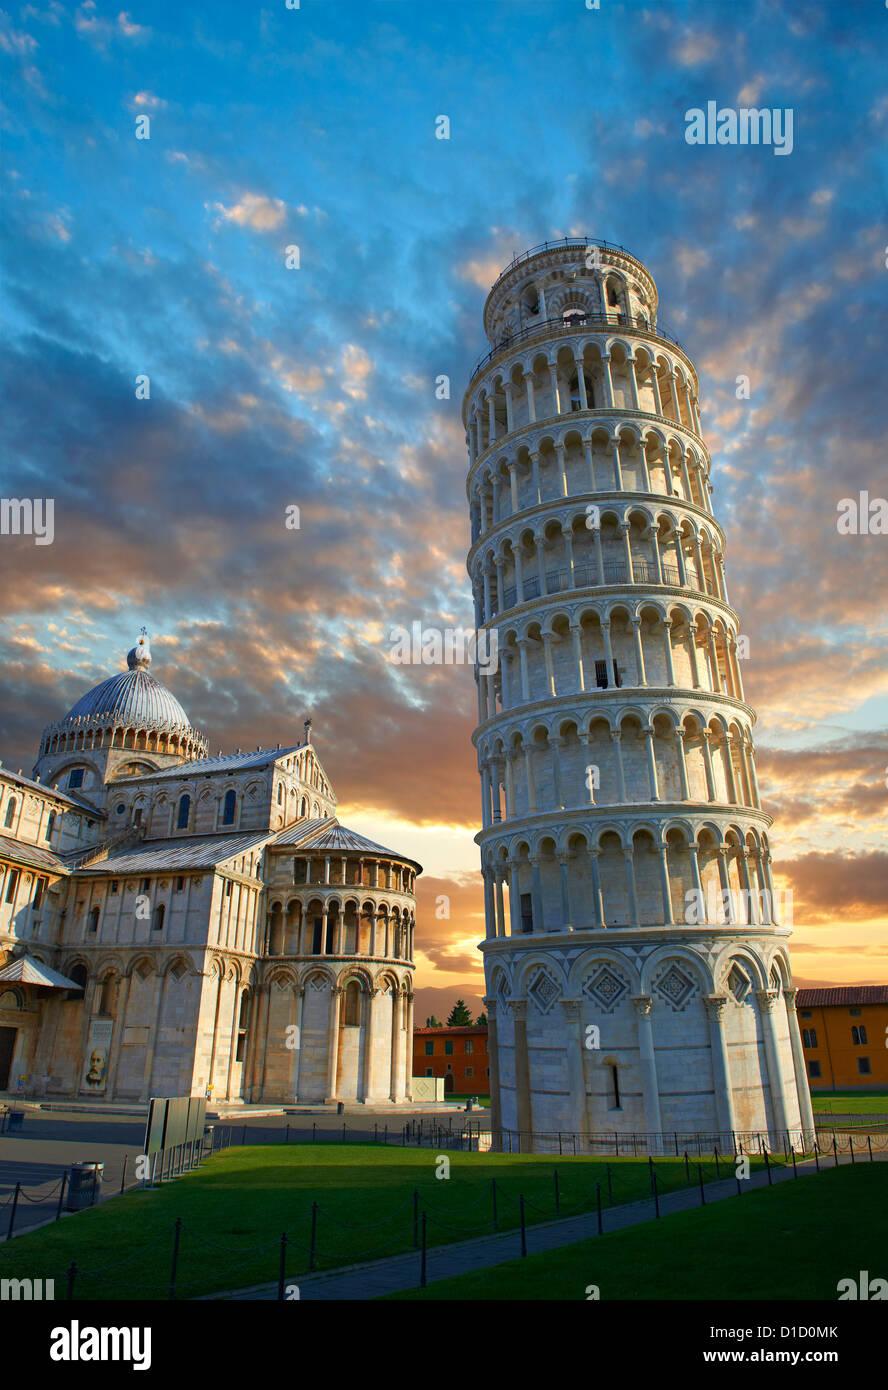 La Torre Inclinada de Pisa al atardecer, Italia Imagen De Stock